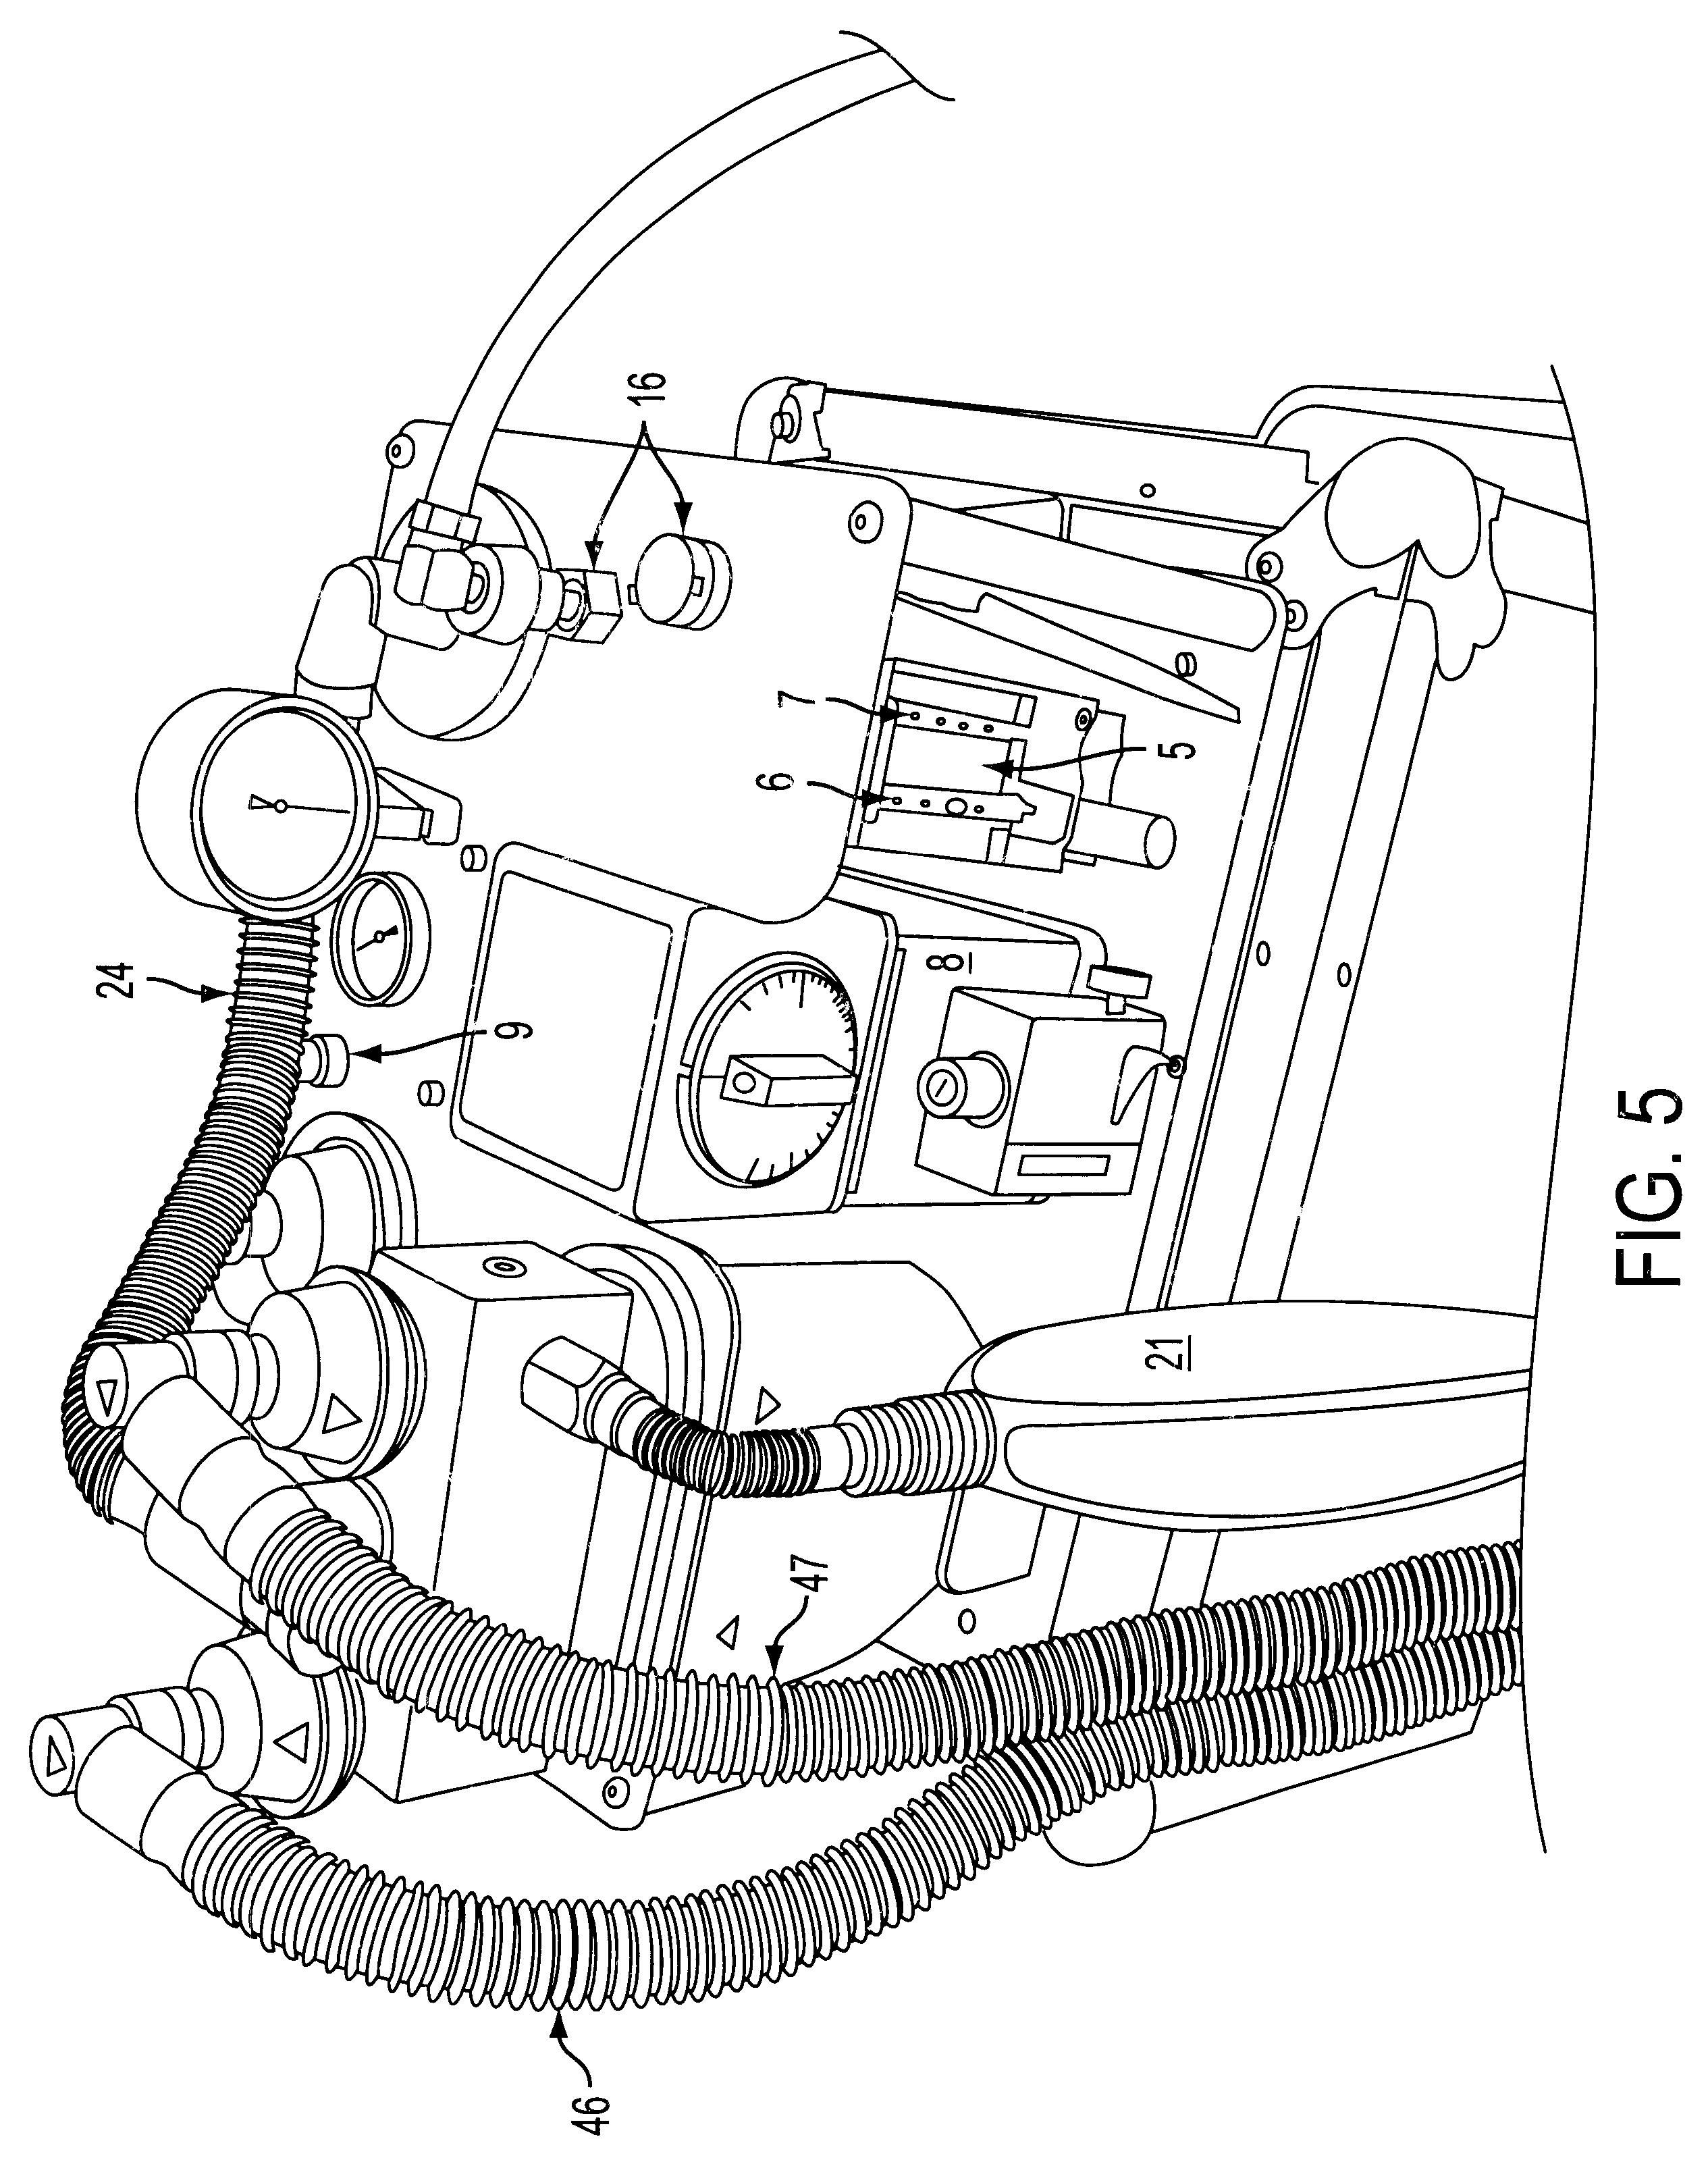 block diagram pulse oximeter box wiring diagram  patent us6536430 portable anesthesia rebreathing system pulse oximetry block diagram pulse oximeter